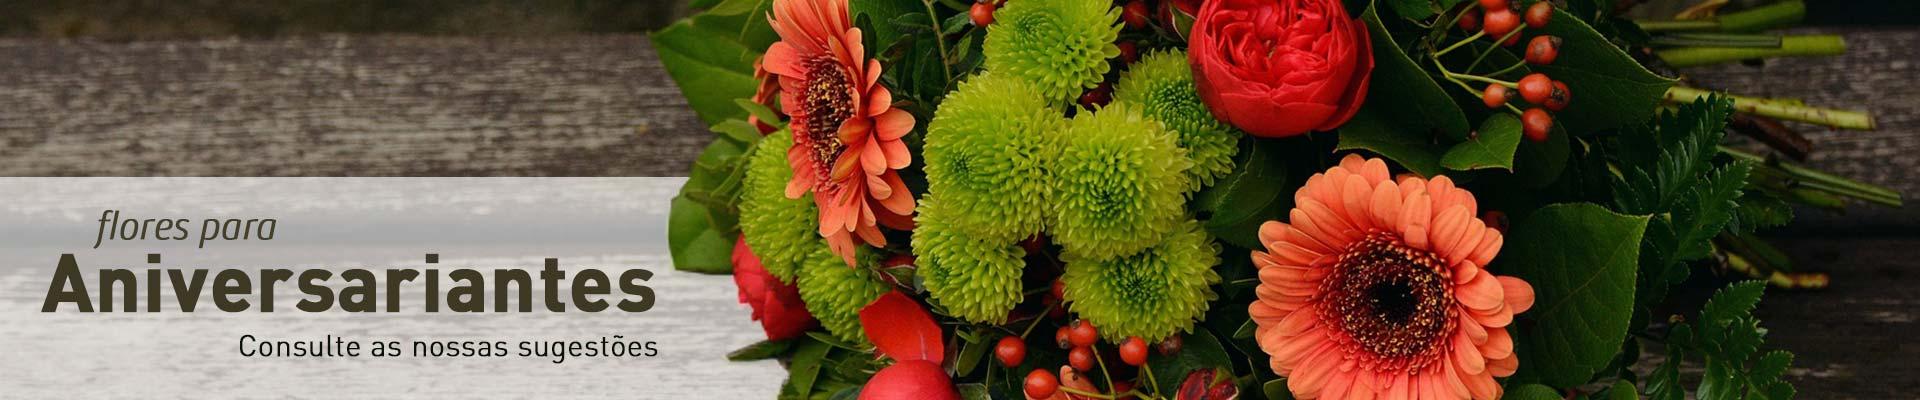 Flores para Aniversariantes